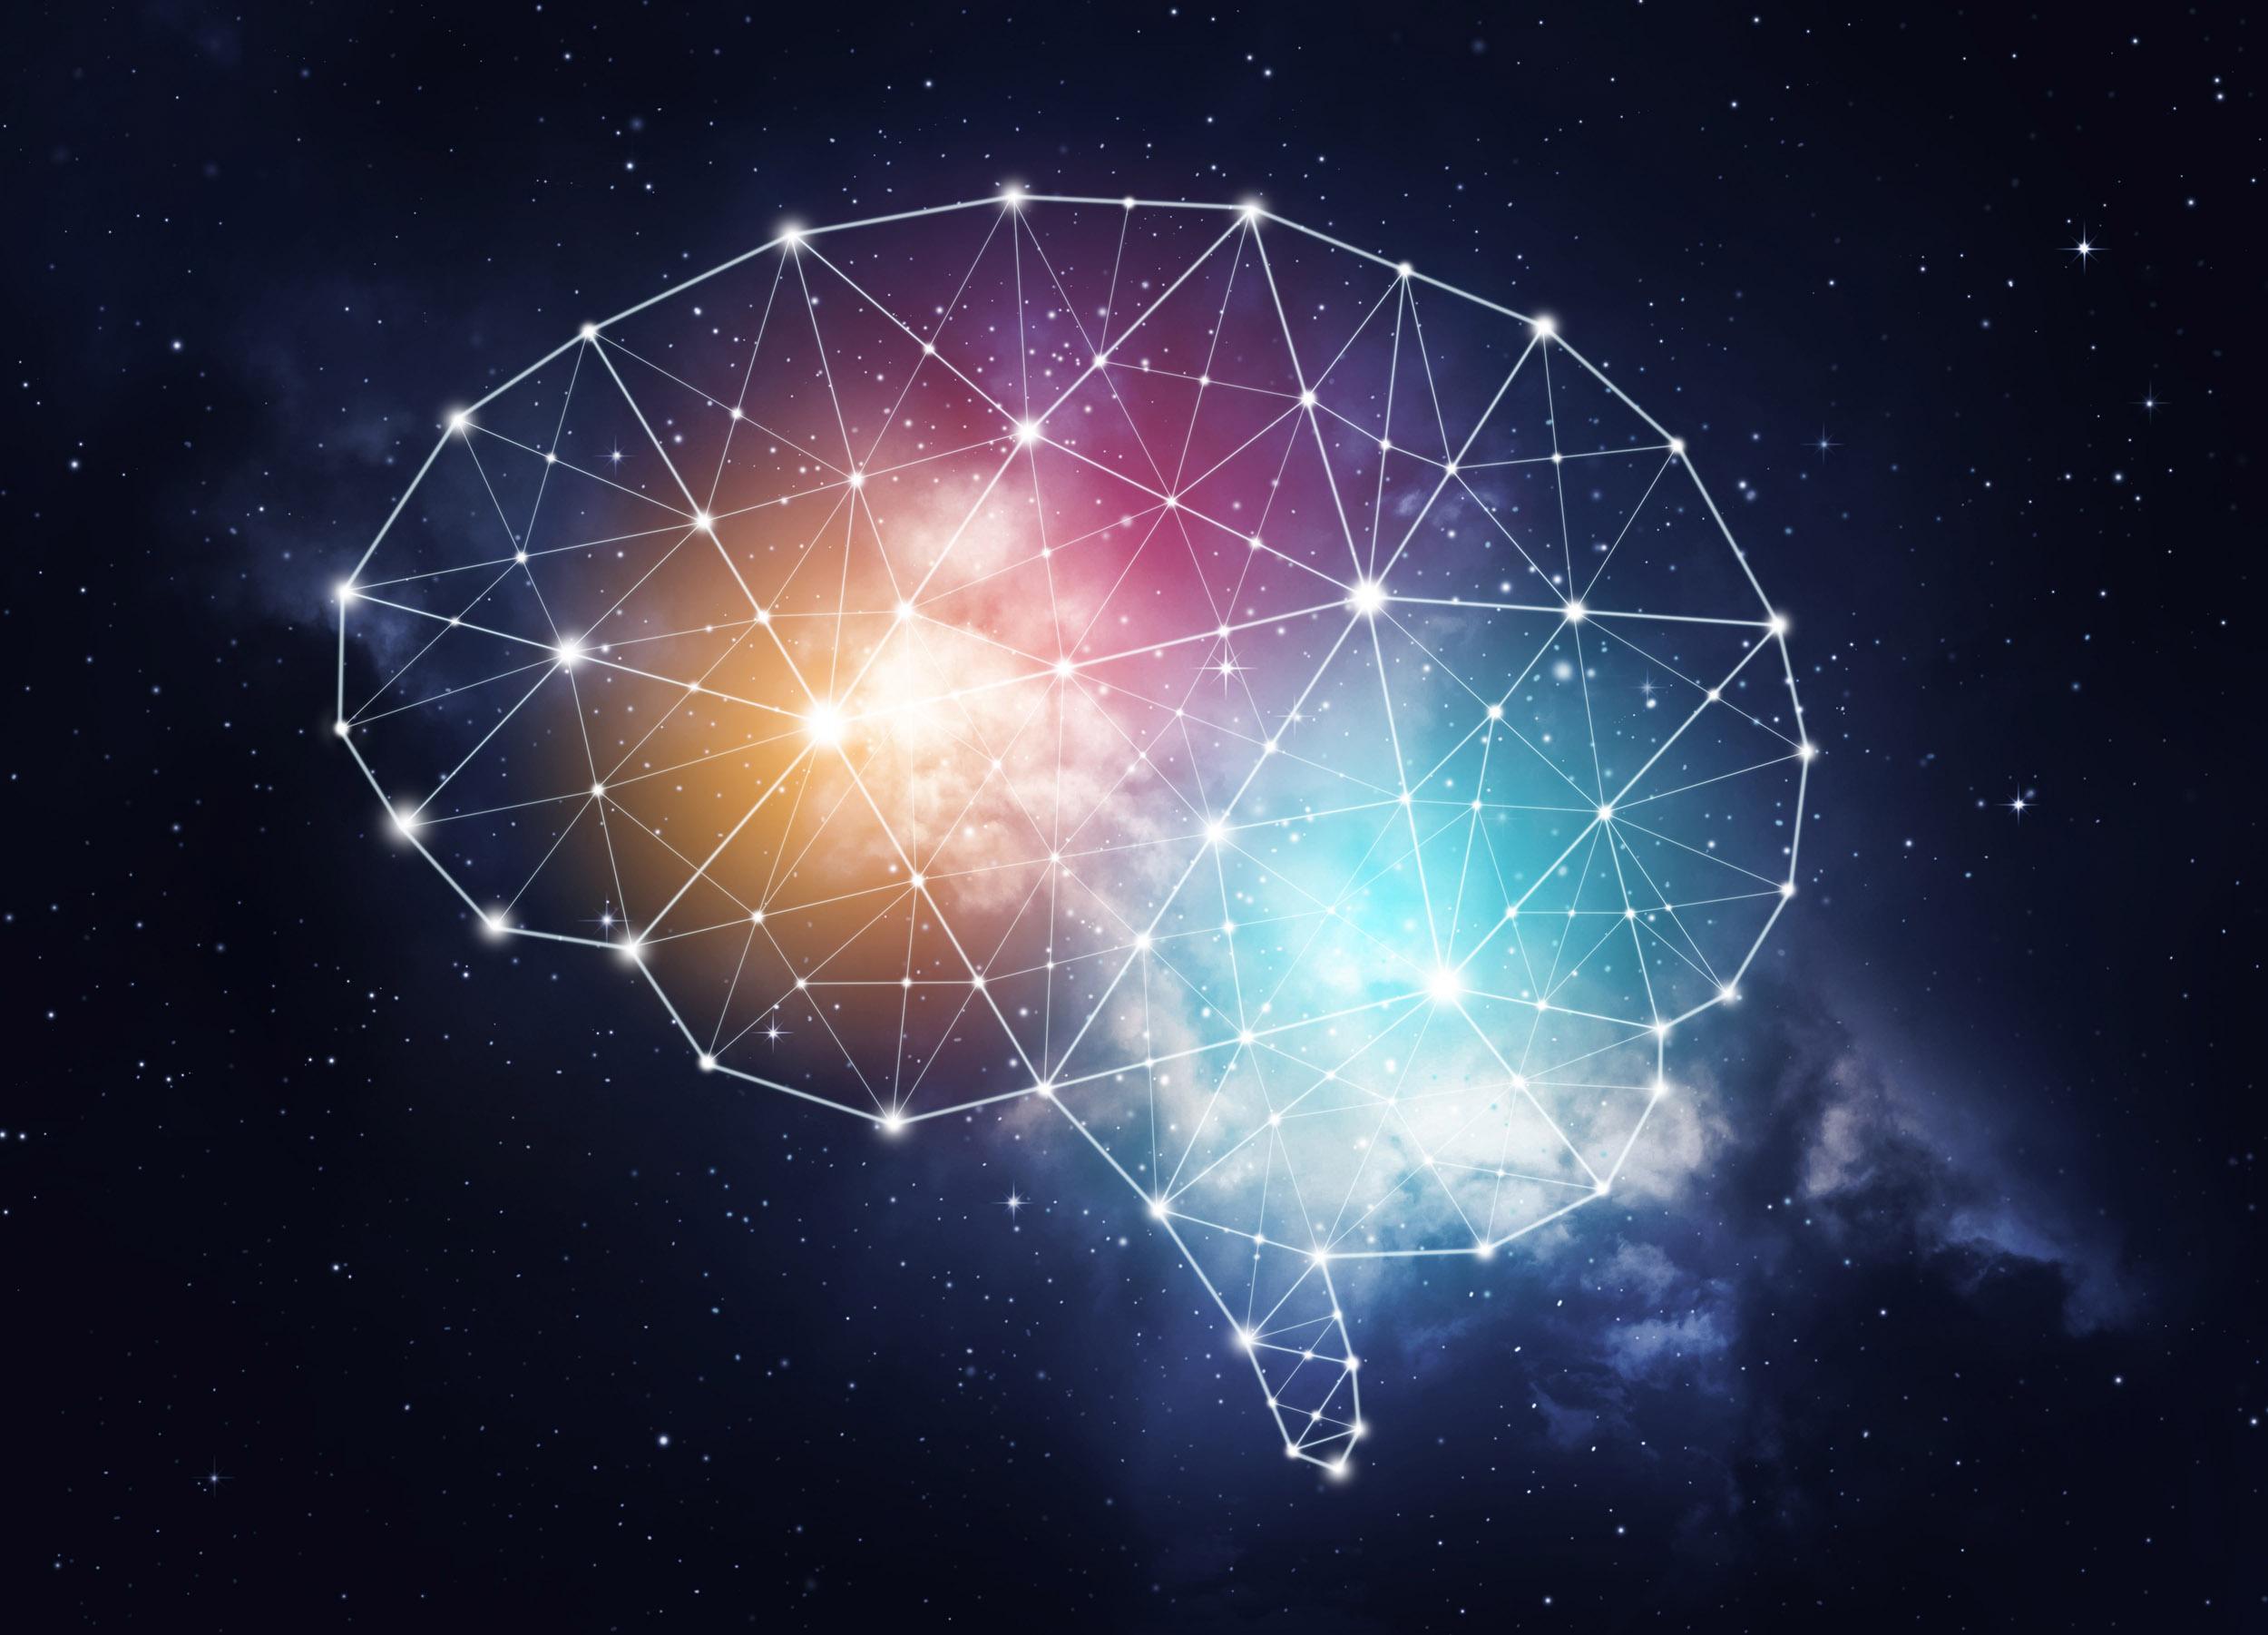 Allen brain atlas - A Revolutionary Approach to Brain Science